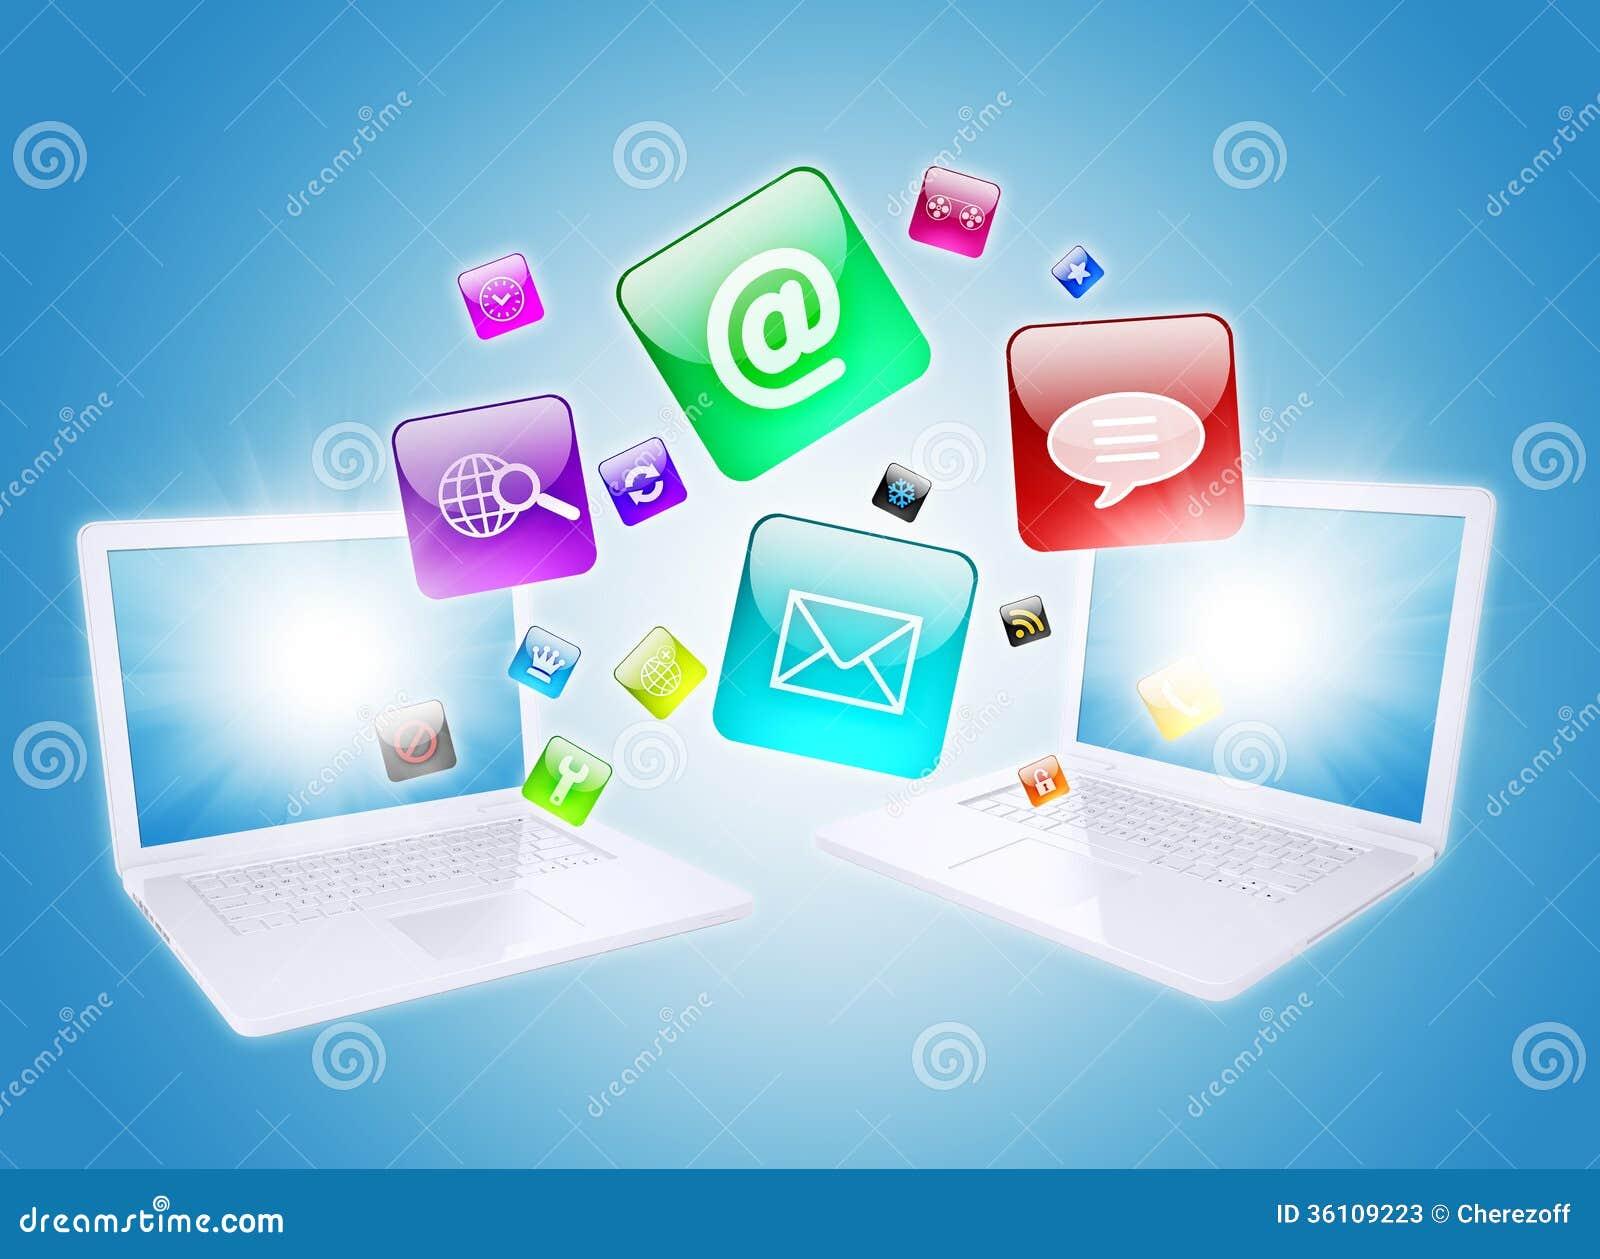 Business plan software programs